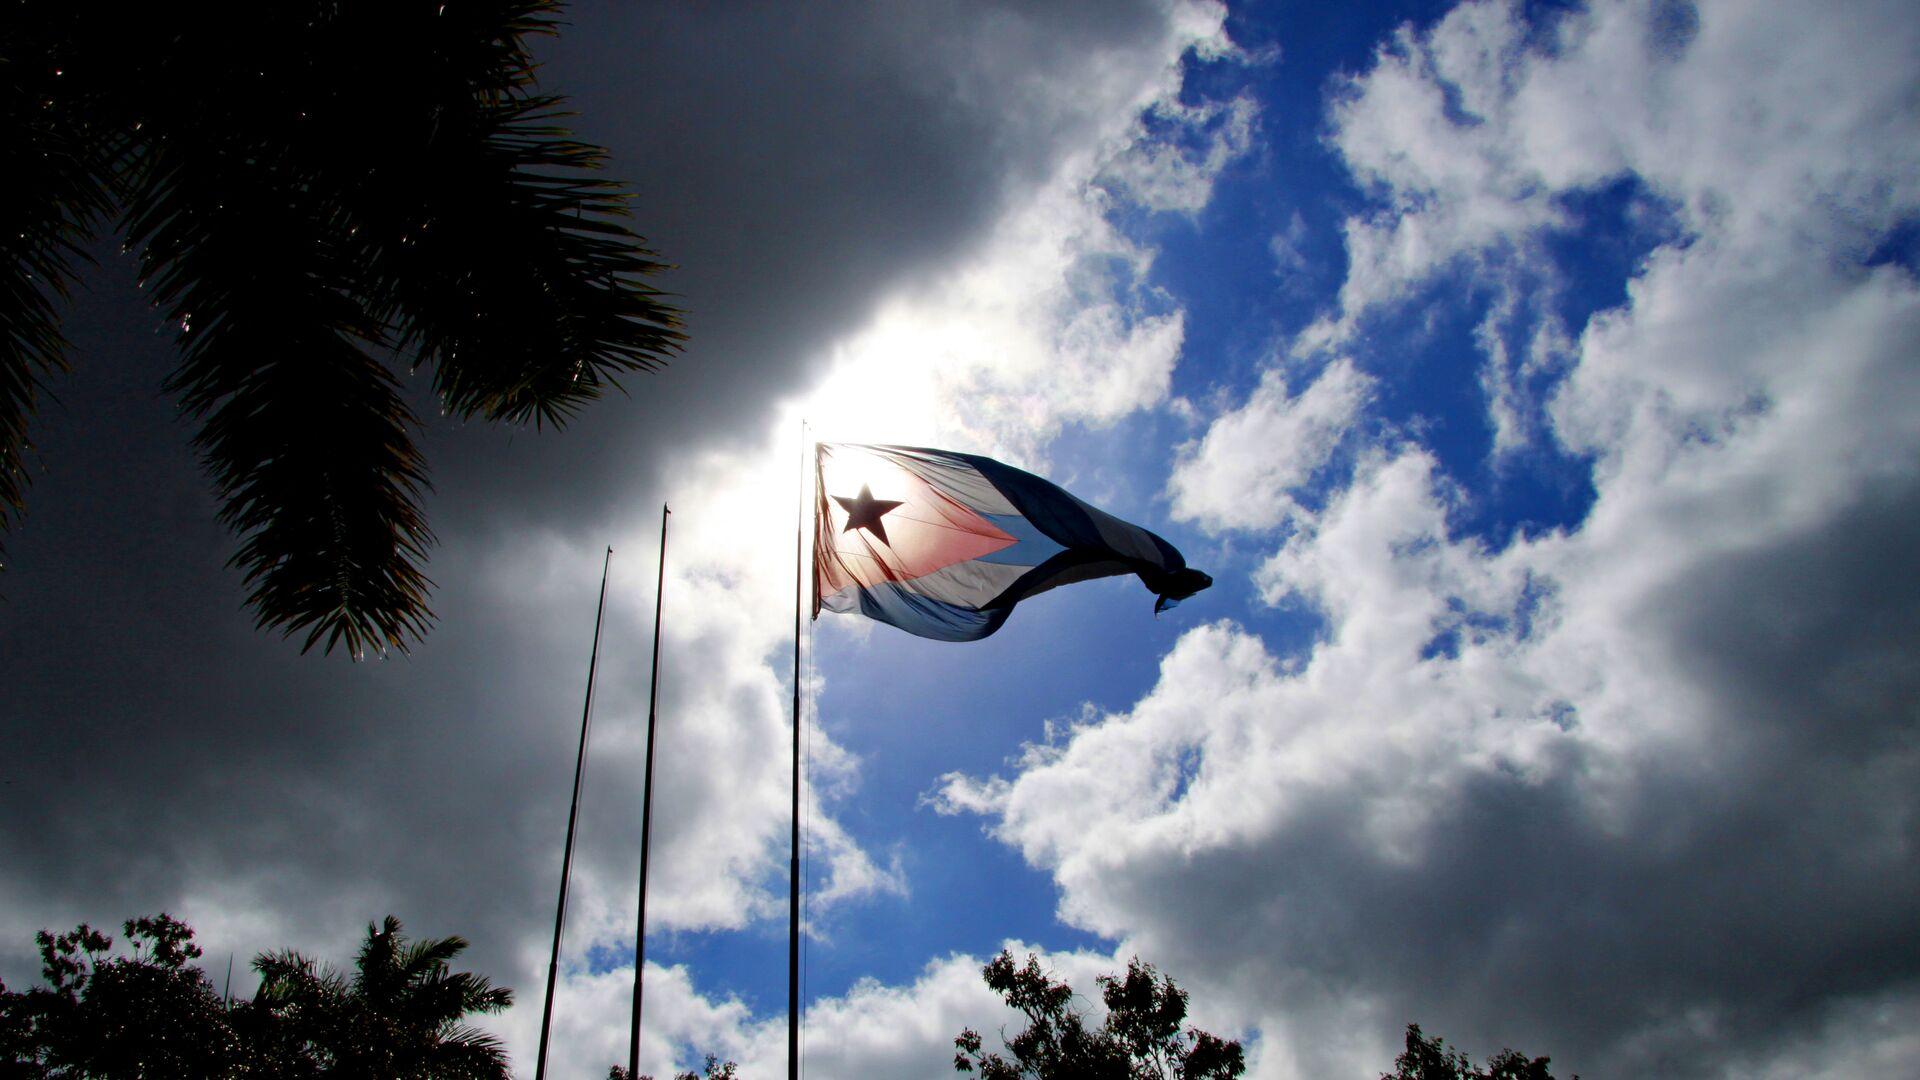 La bandiera cubana - Sputnik Italia, 1920, 13.08.2021